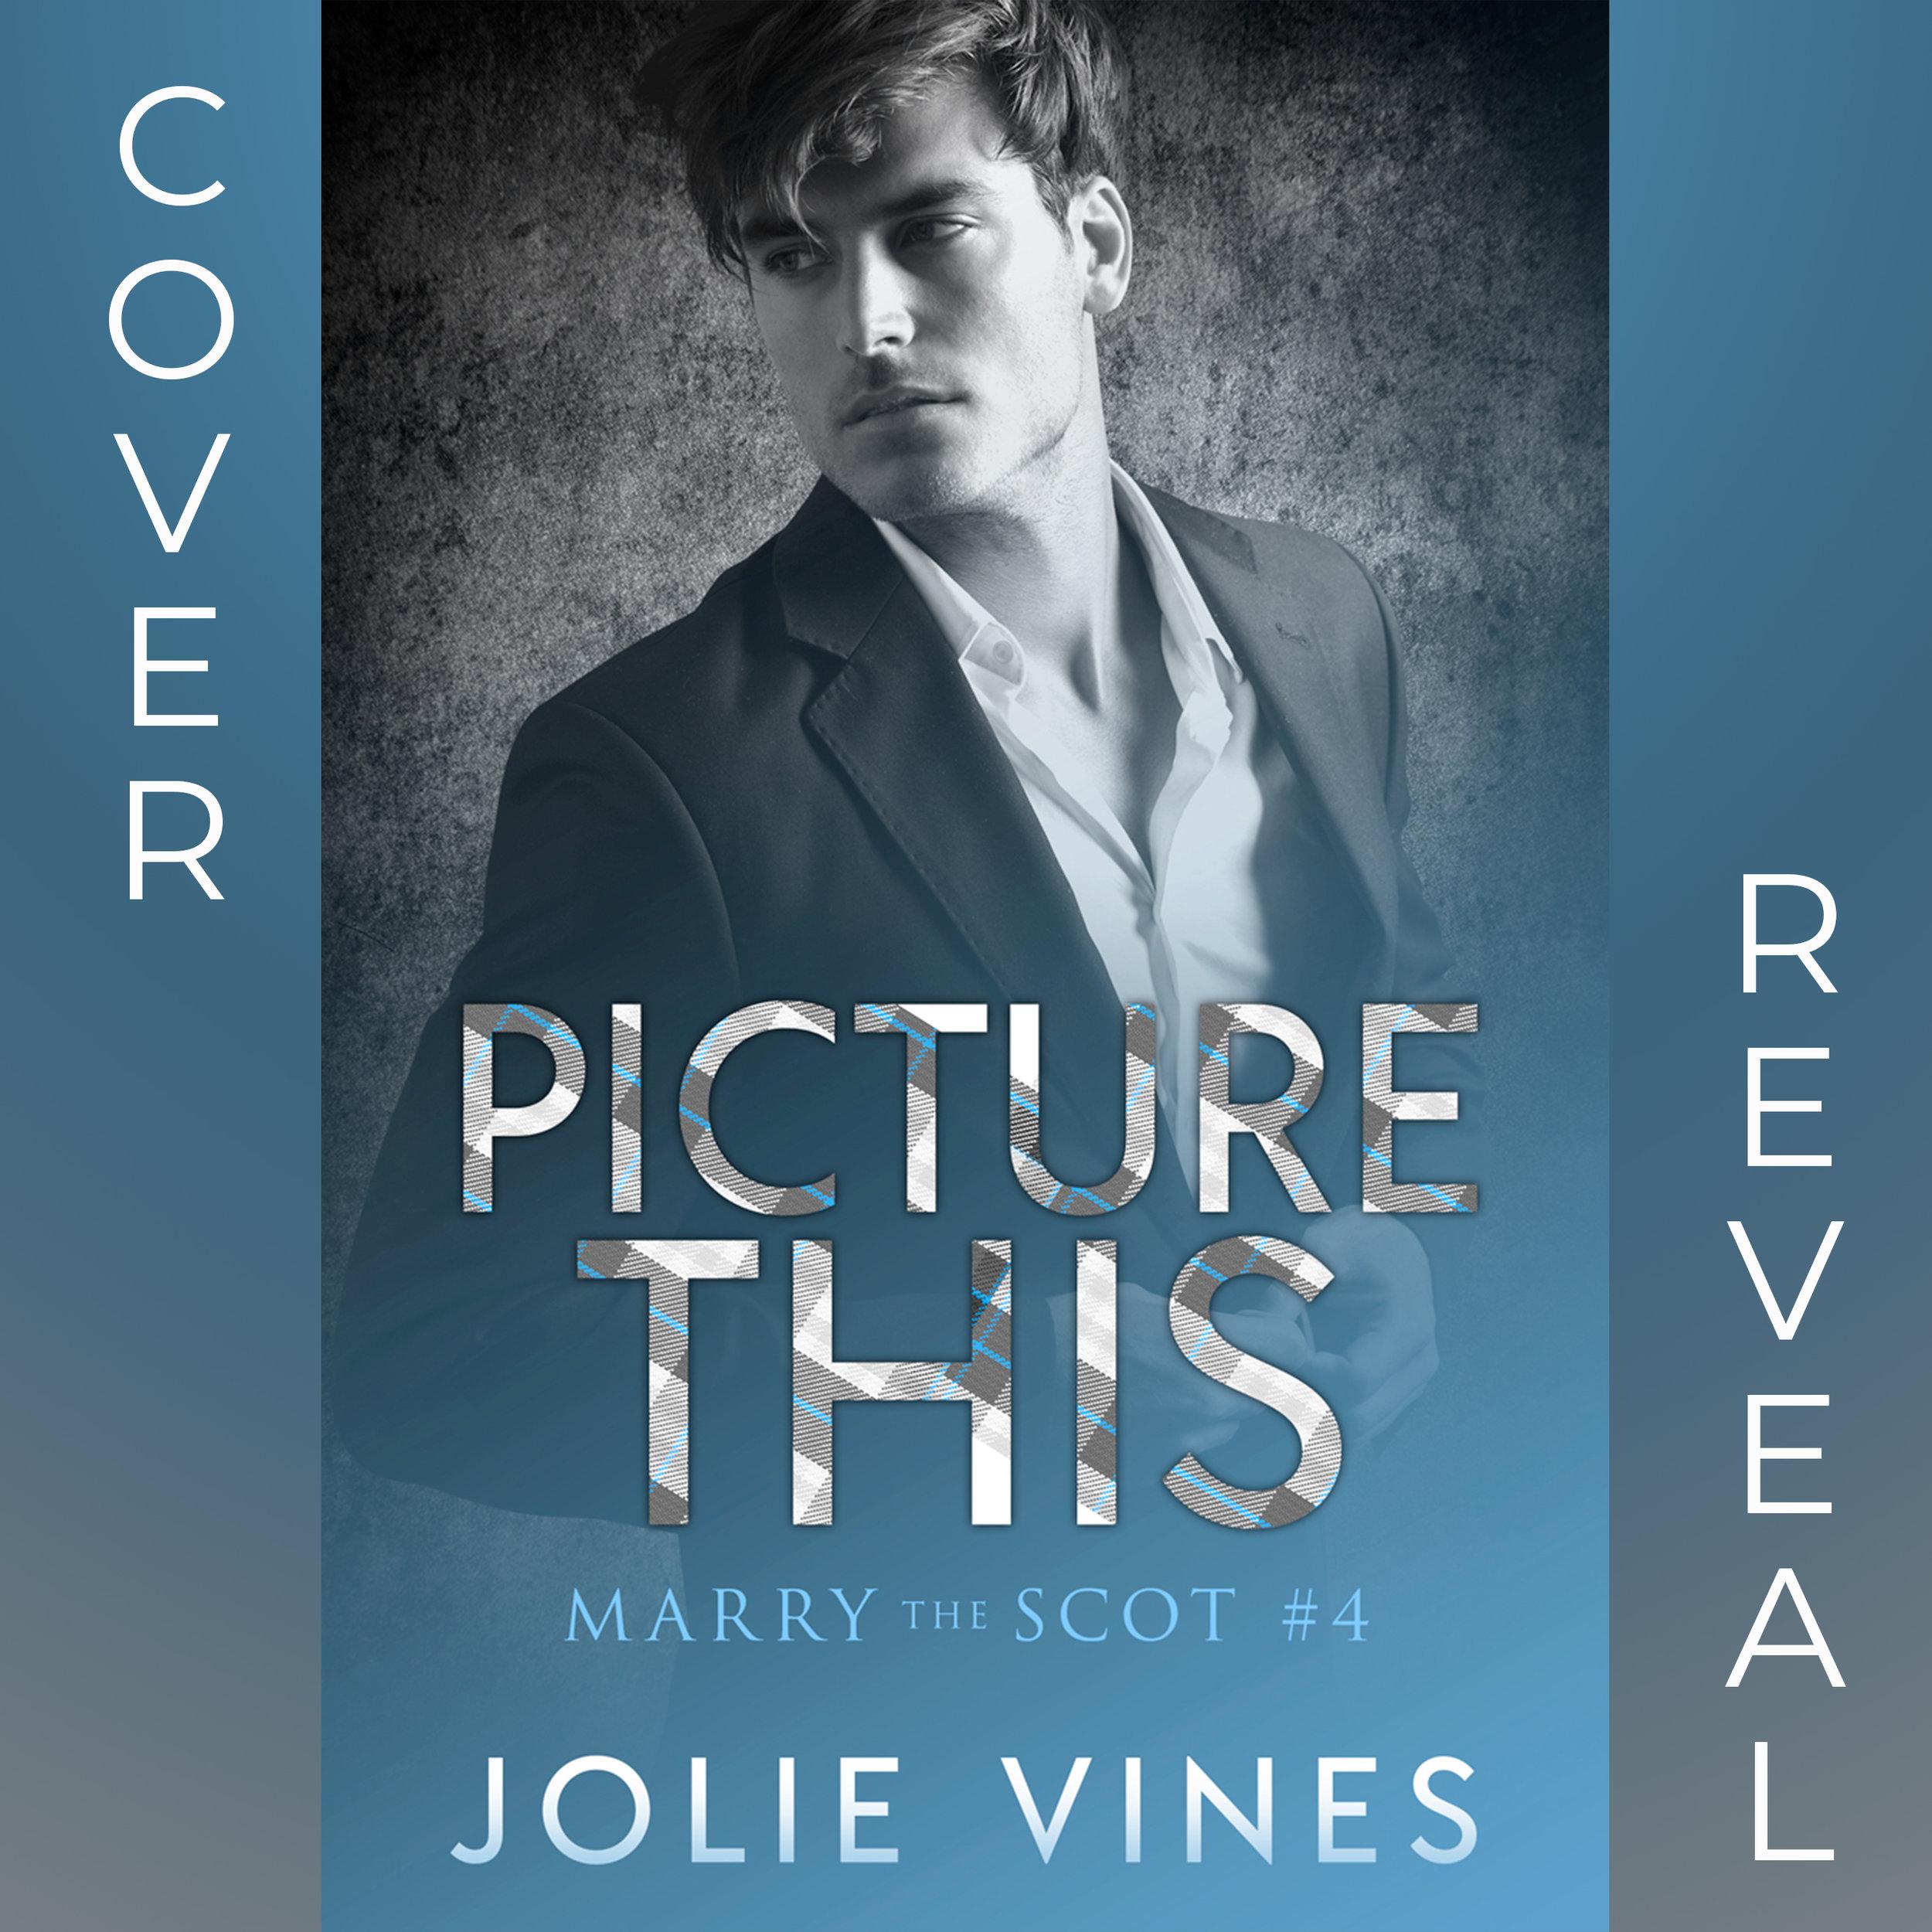 PT ripped cover REVEAL.jpg